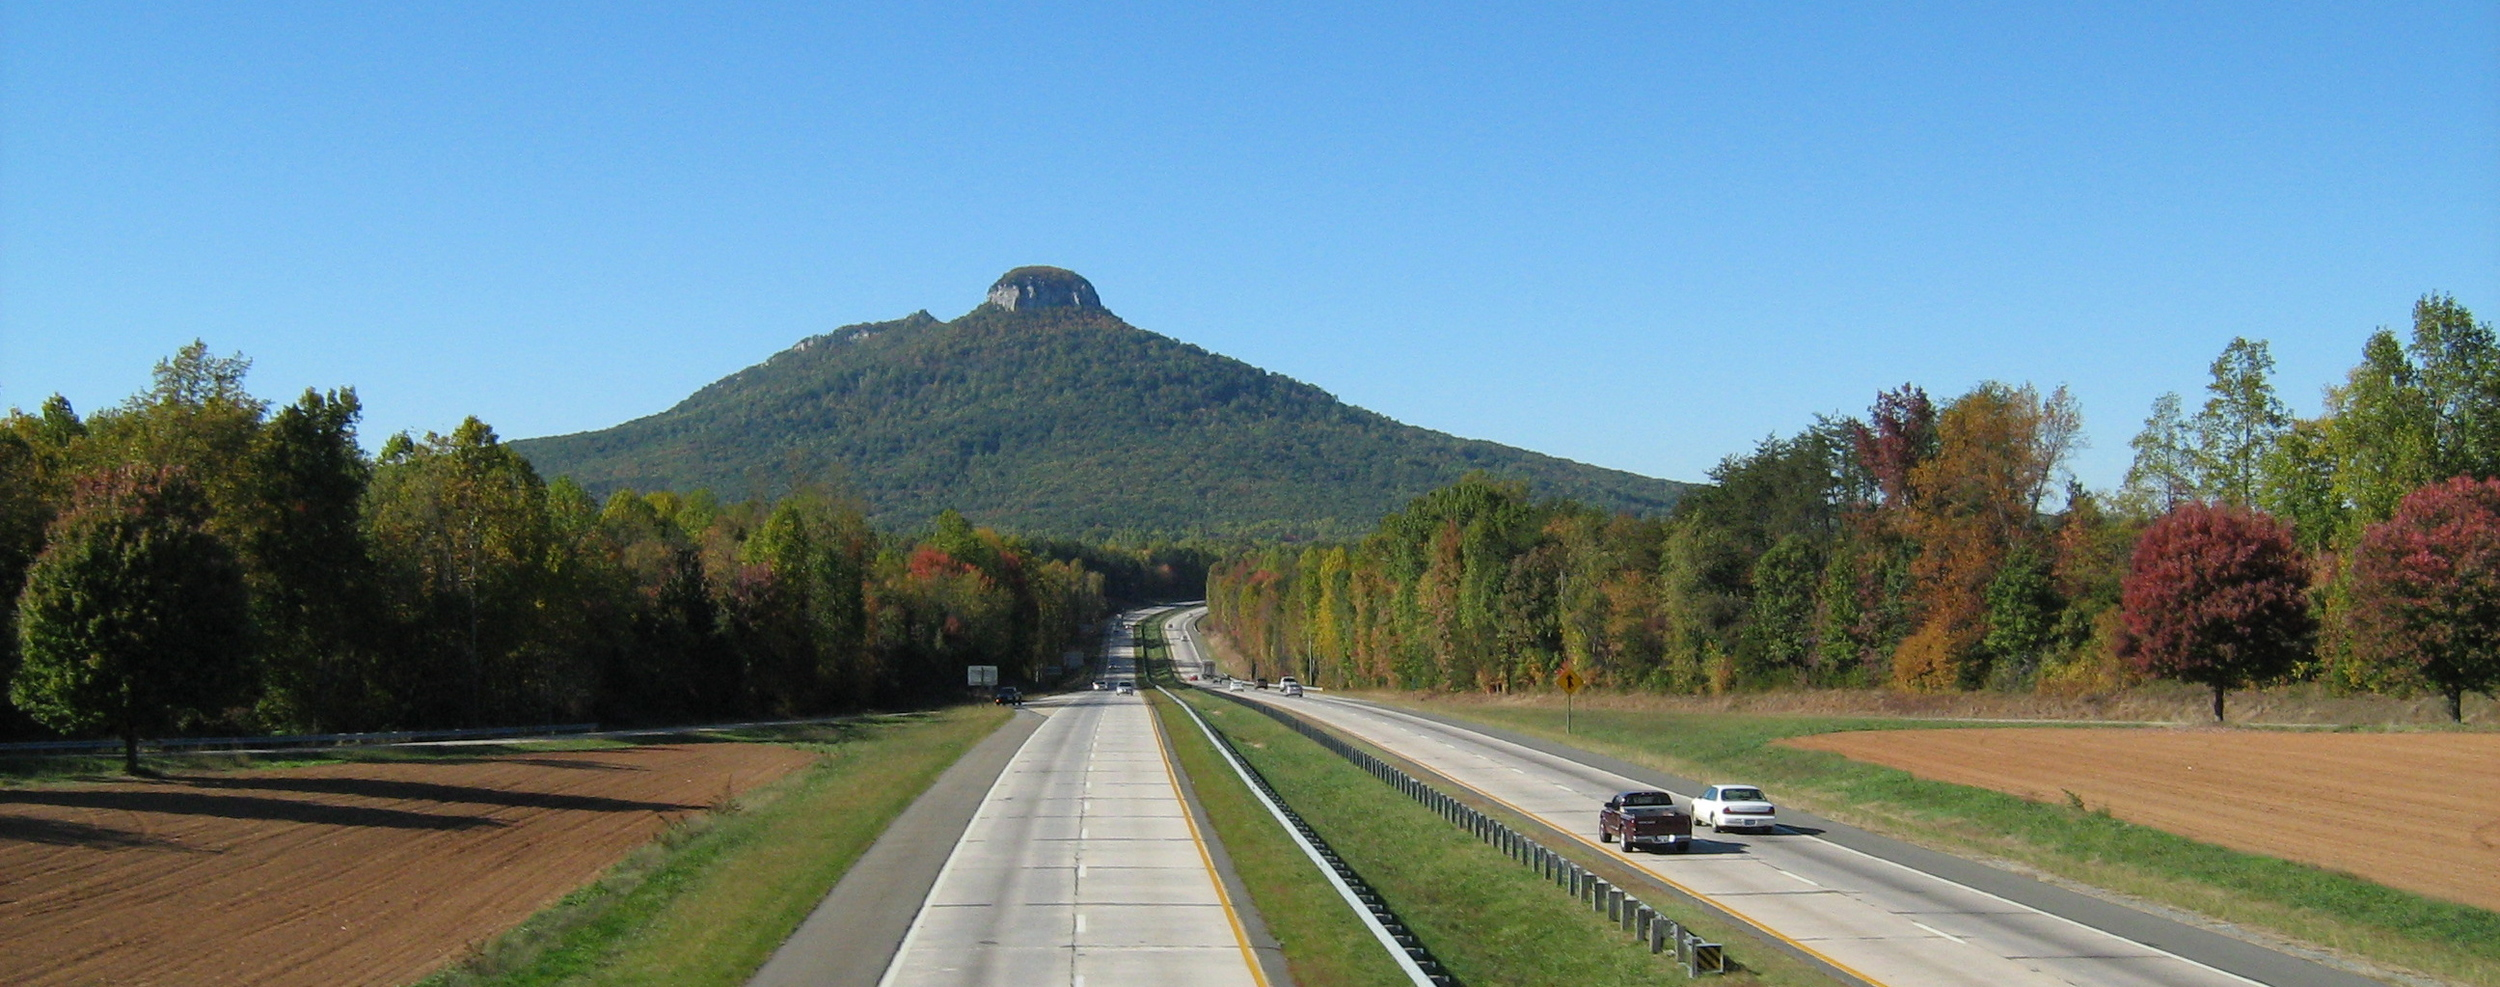 The nipple hill.